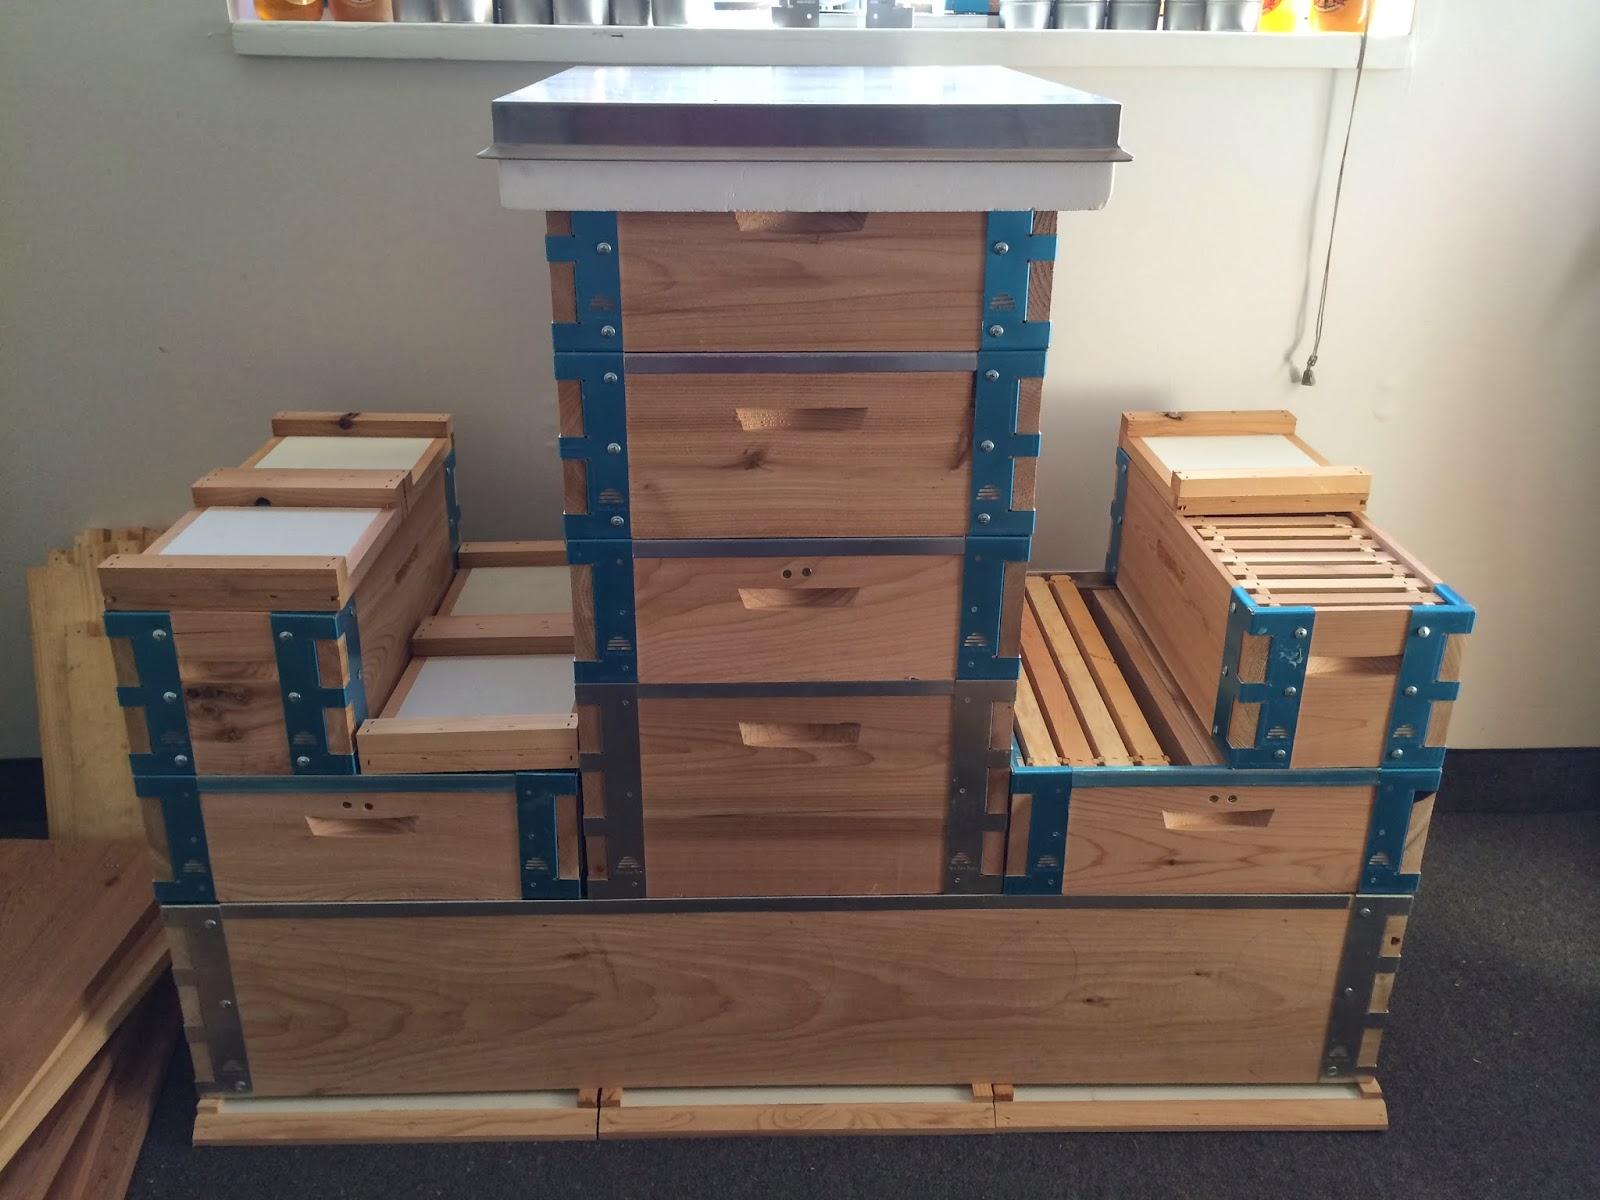 Attirant Beehive Kits, Cedar Langstroth, Top Bar, Comb, Honey Bee, Utah Hive